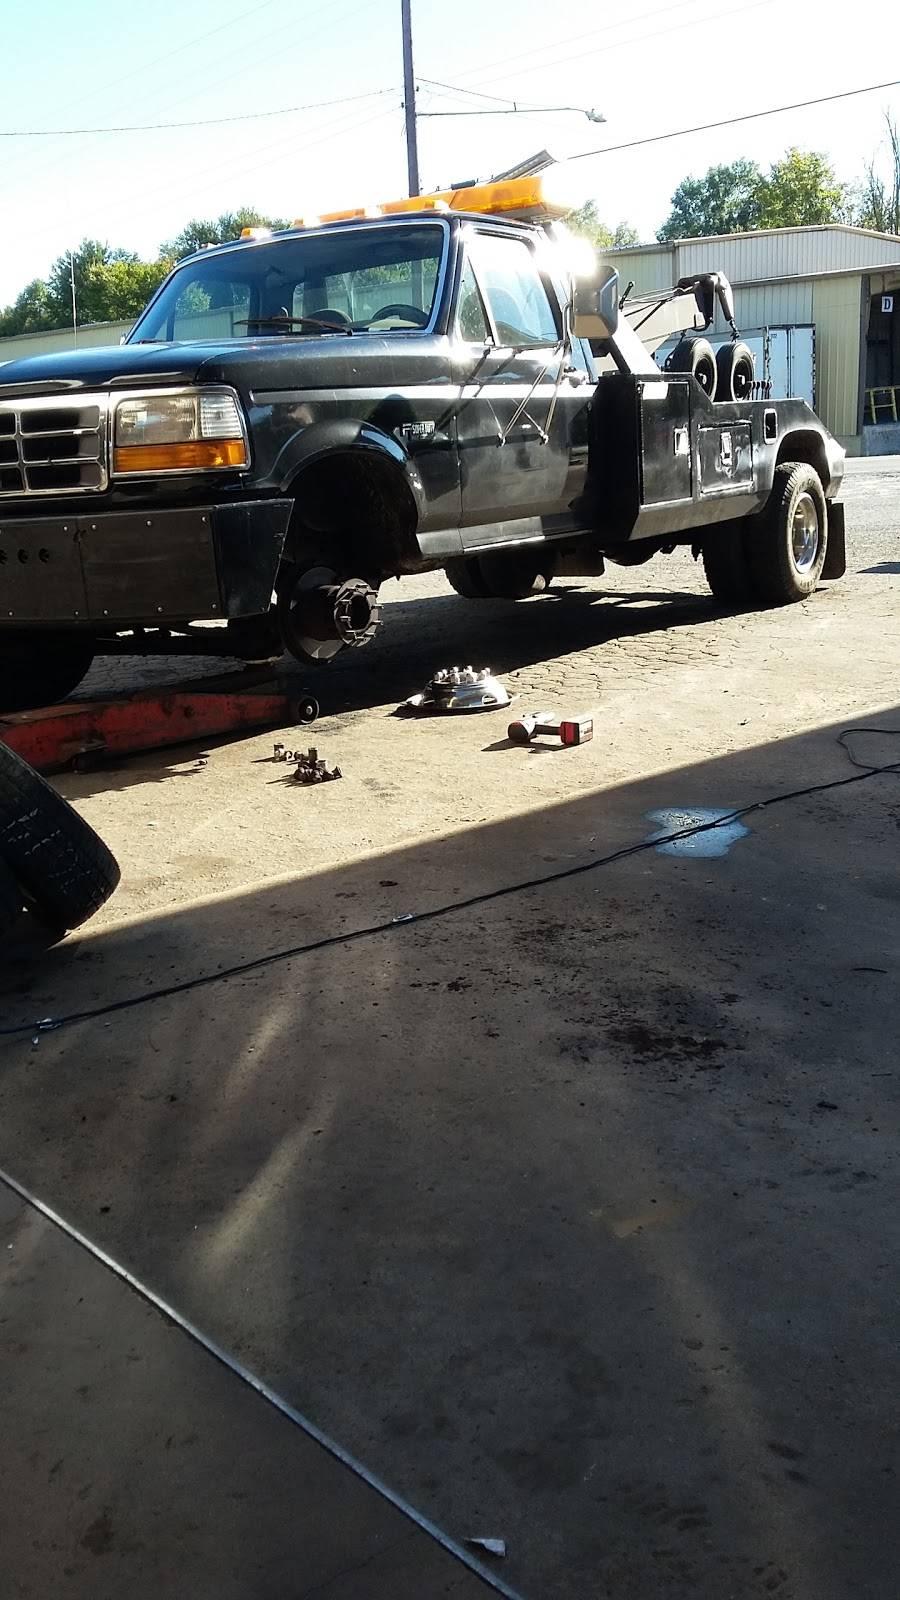 B & R Tire Services - car repair  | Photo 9 of 10 | Address: 4120 N Glenn Ave, Winston-Salem, NC 27105, USA | Phone: (336) 767-2910